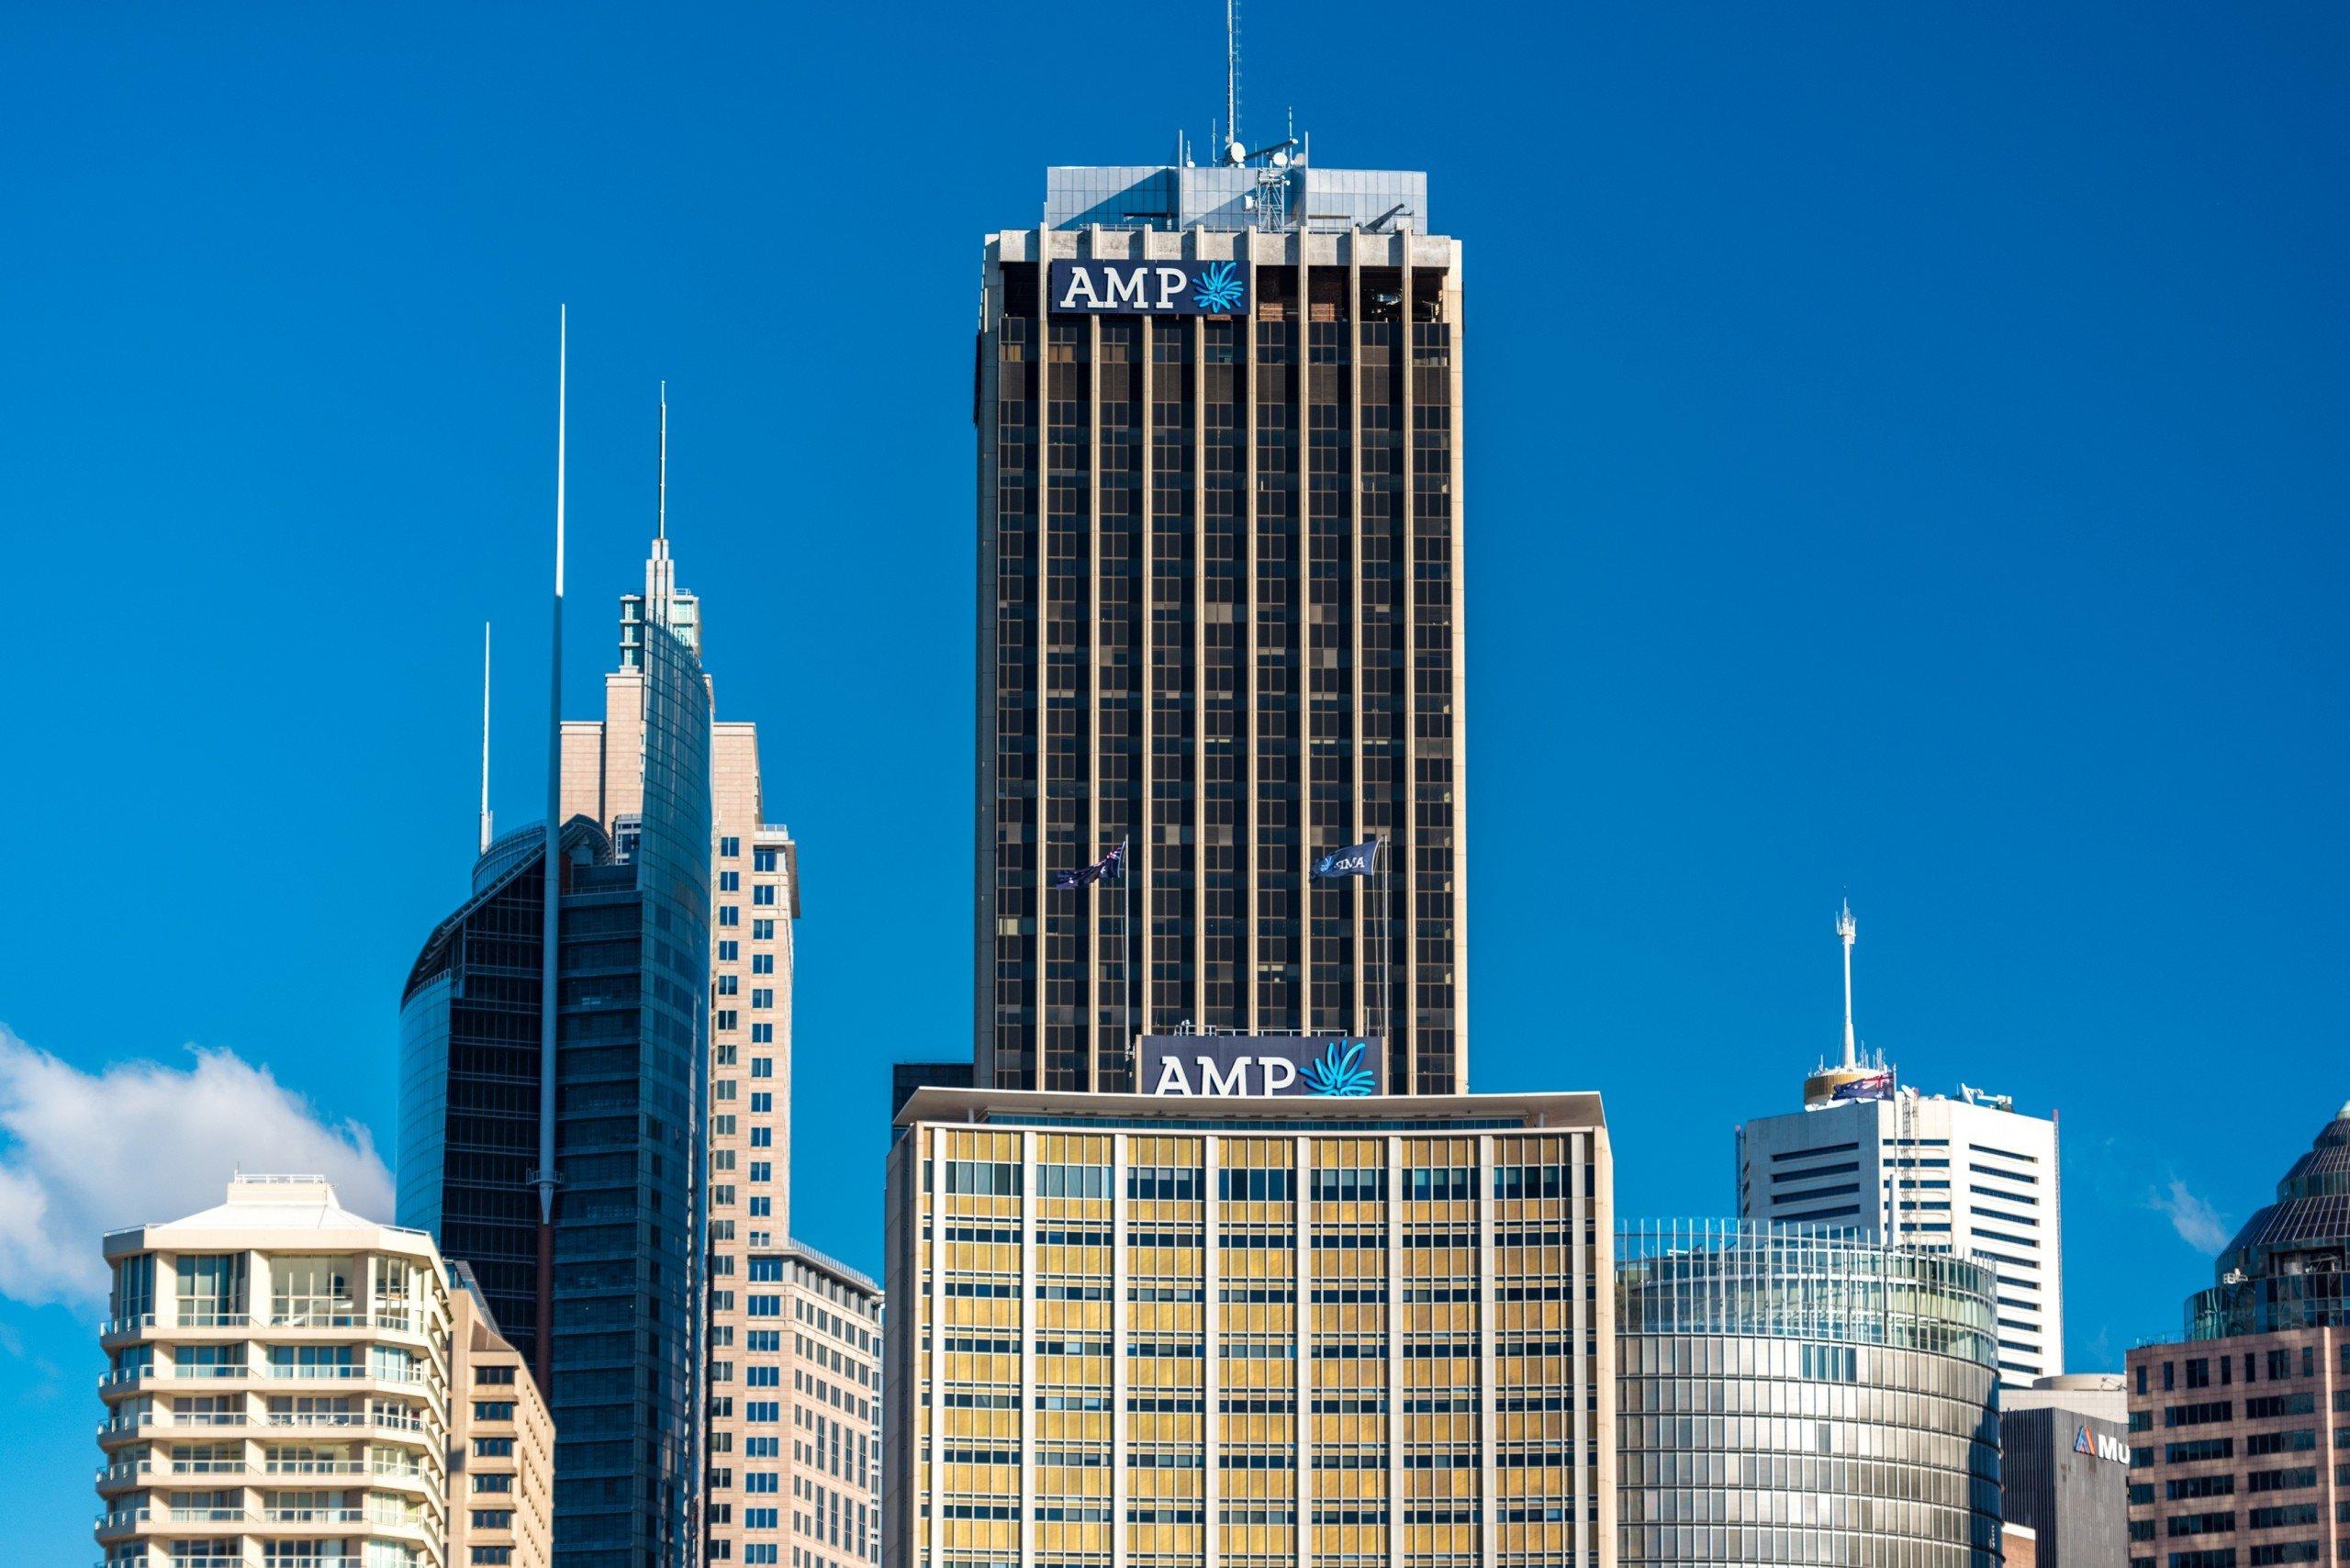 AMP building in Sydney